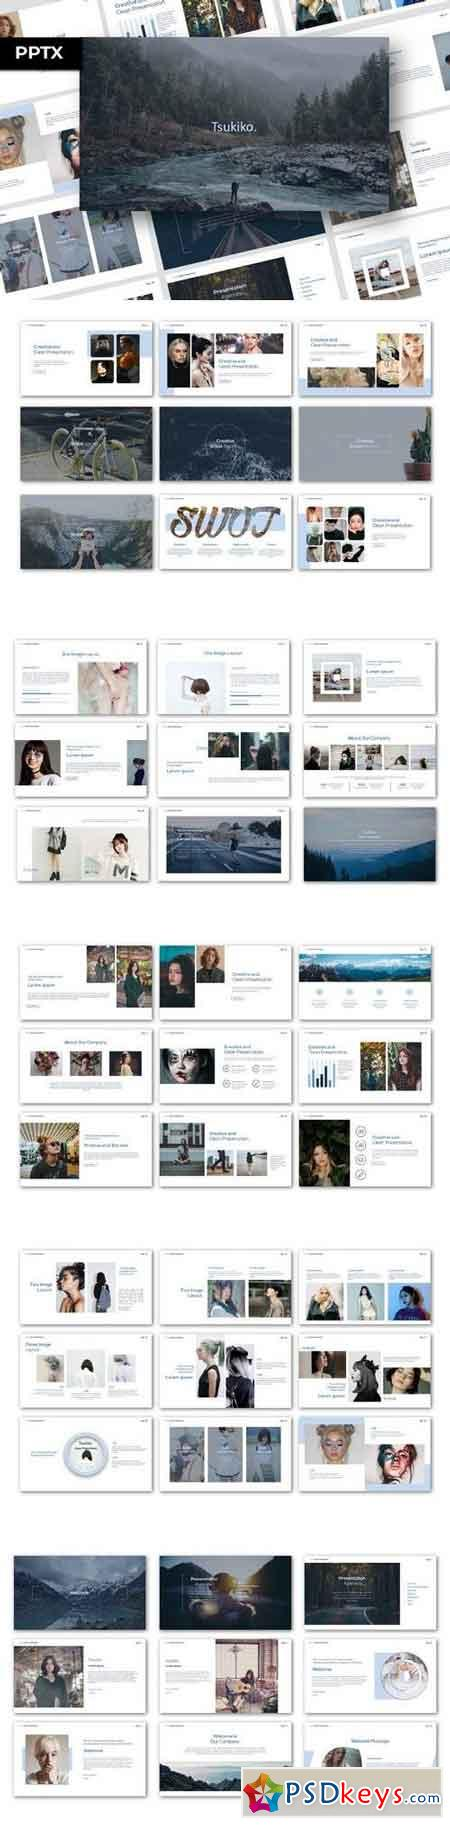 Tsukiko - Powerpoint, Keynote, Google Sliders Templates